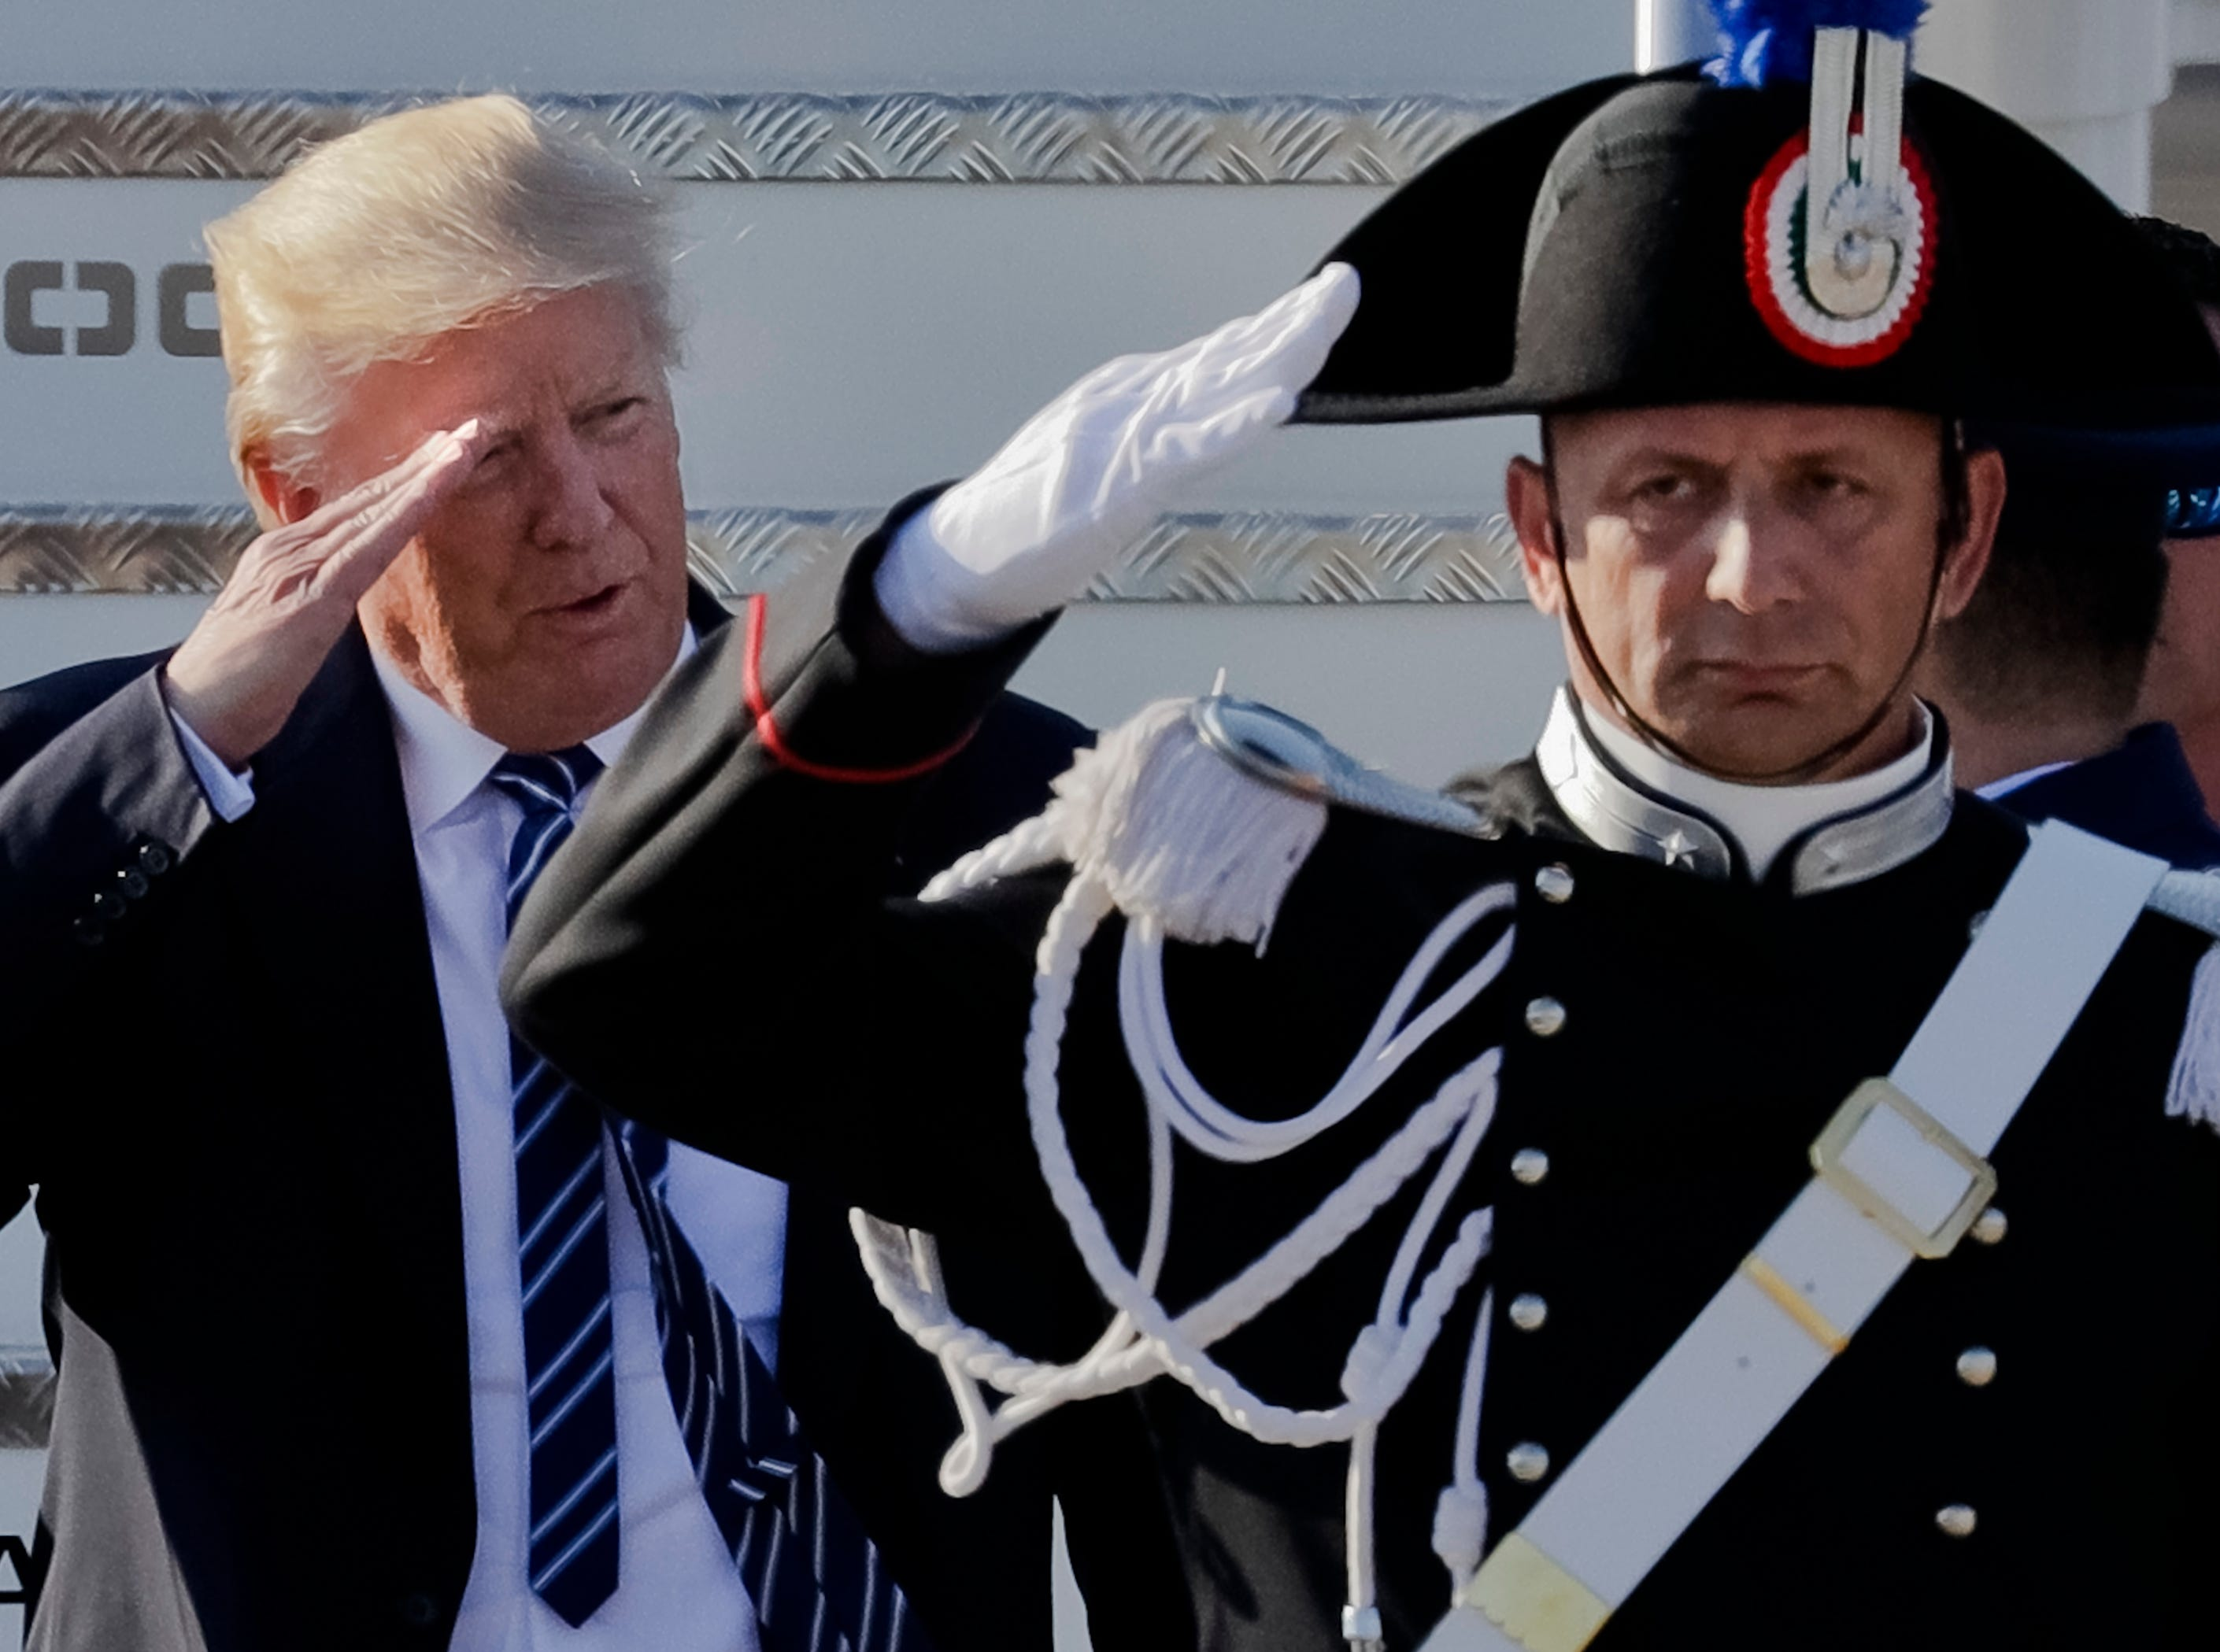 President Trump salutes a Carabinieri paramilitary officer upon his arrival at Fiumicino's Leonardo Da Vinci International airport, near Rome on May 23, 2017.